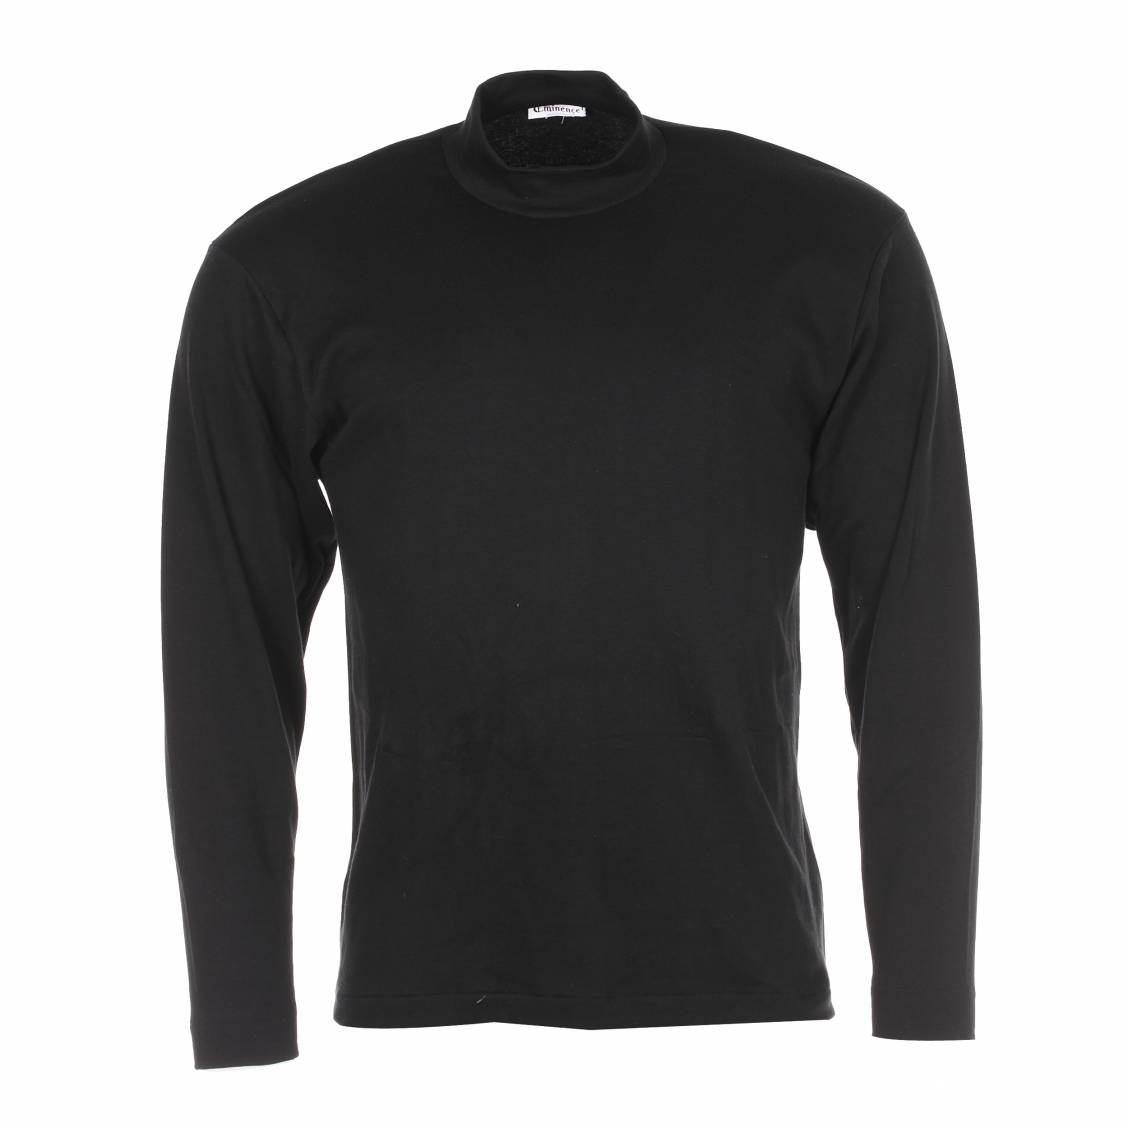 tee-shirt chaud noir à col cheminée